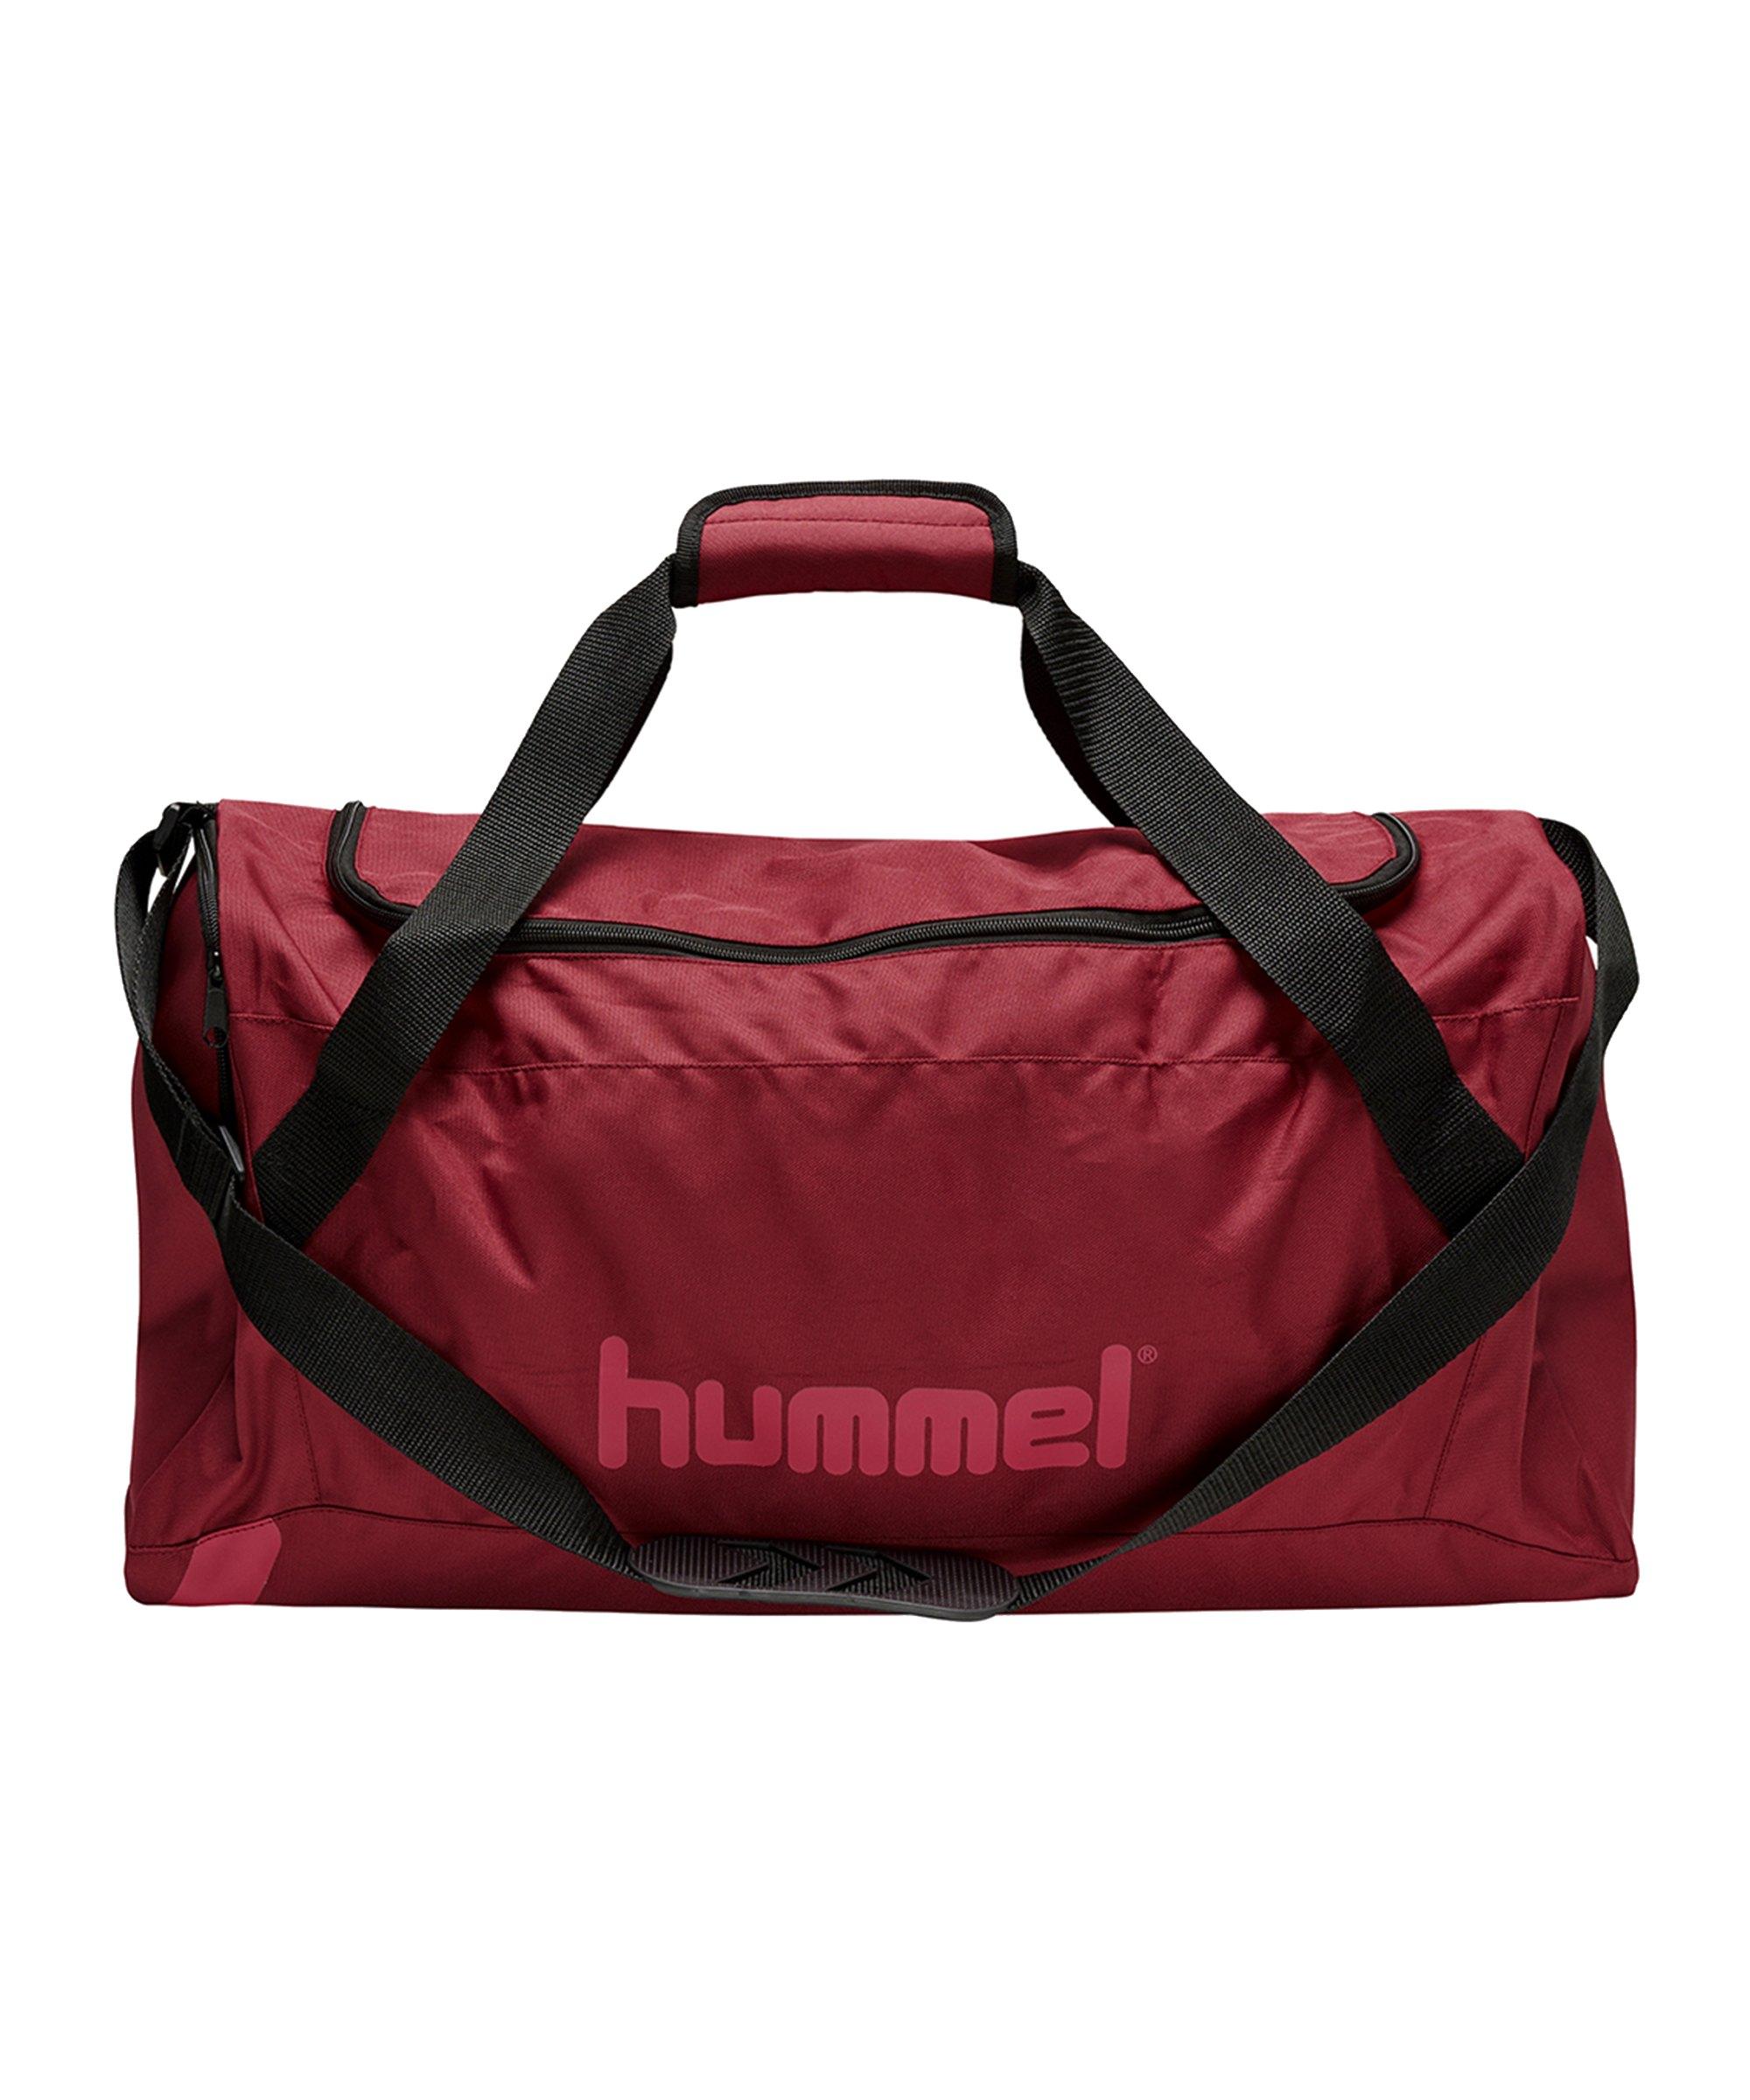 Hummel Core Bag Sporttasche Rot F3583 Gr. S - rot